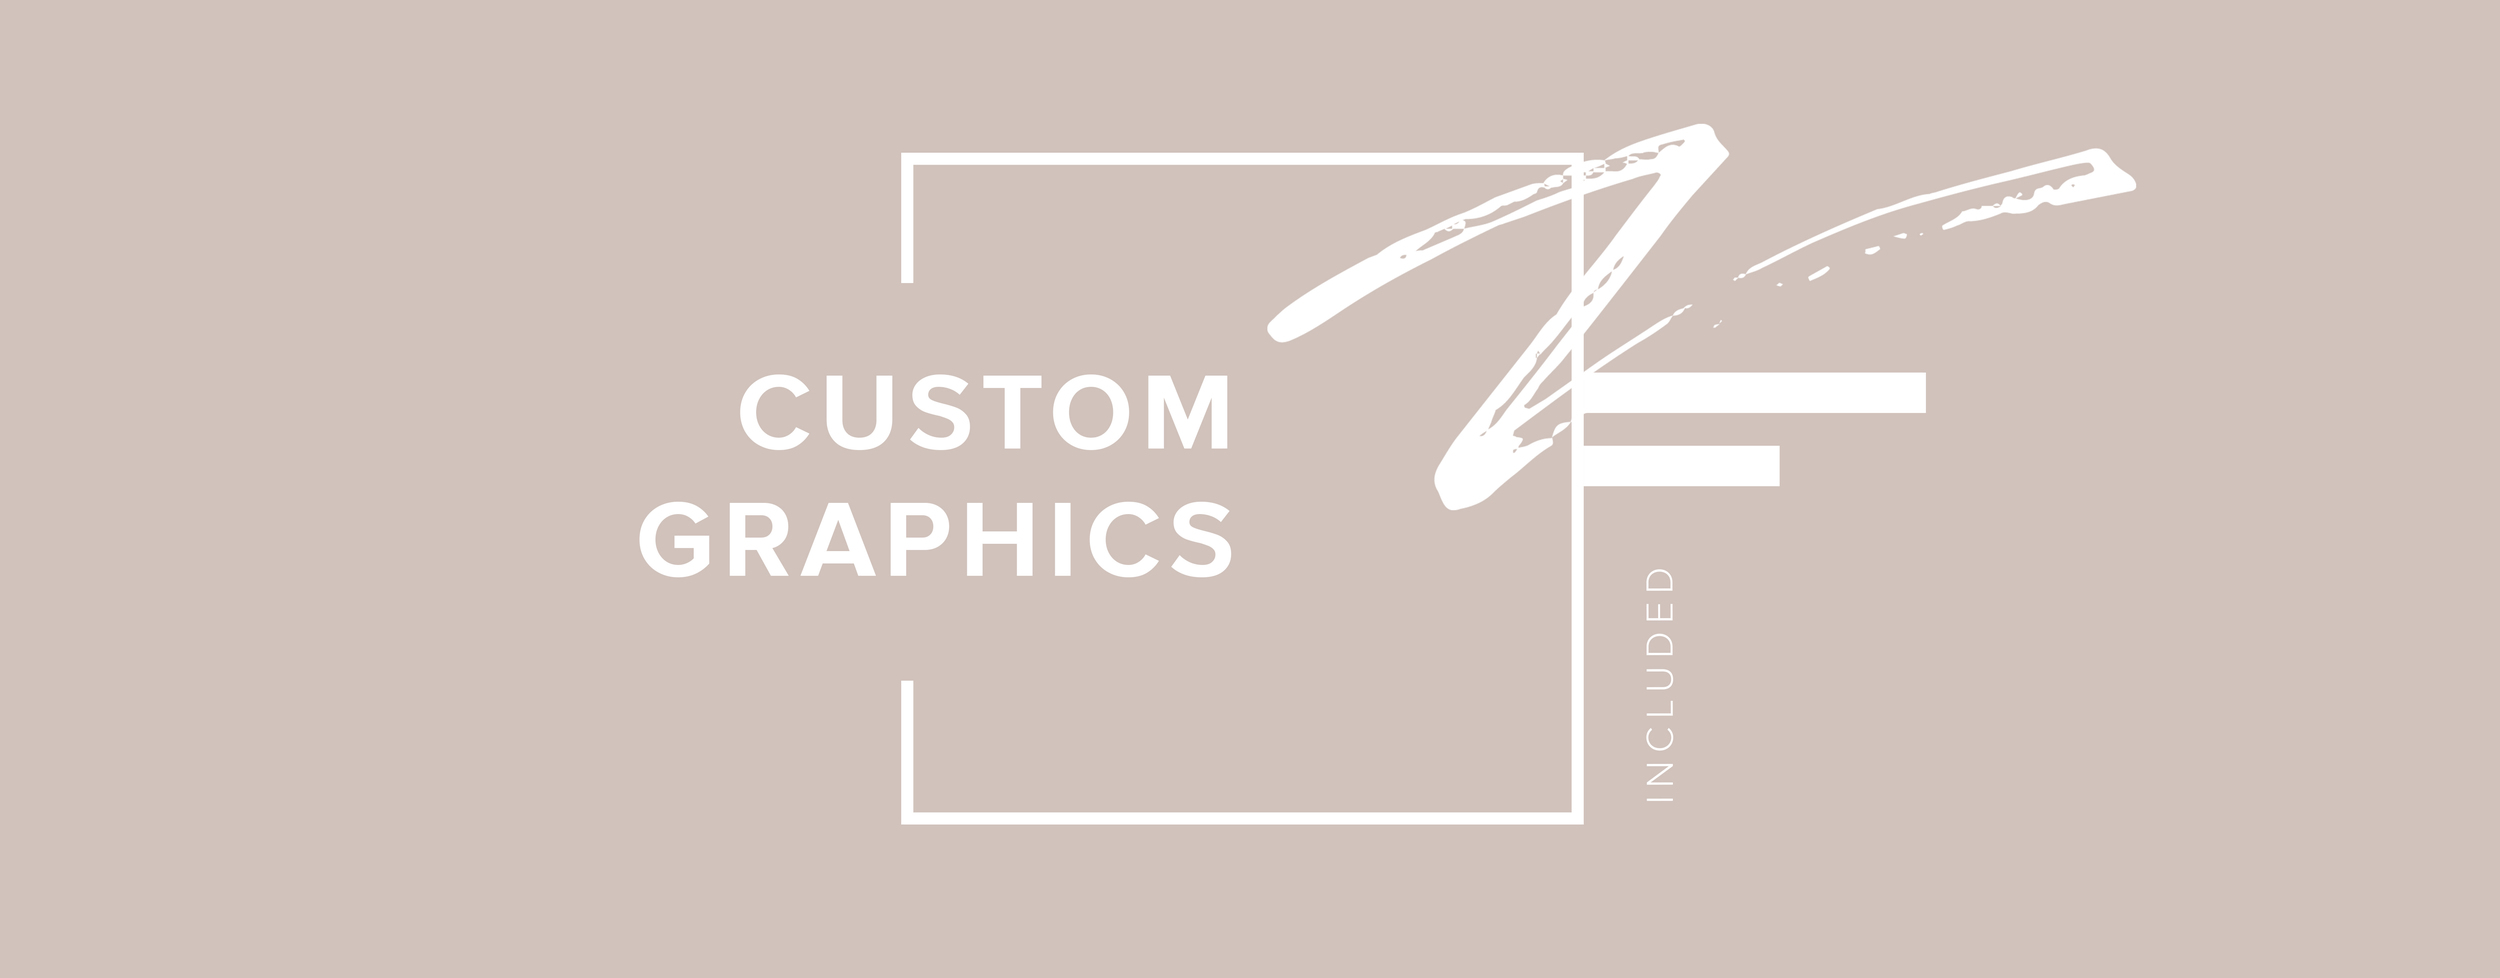 customgraphicsjpg